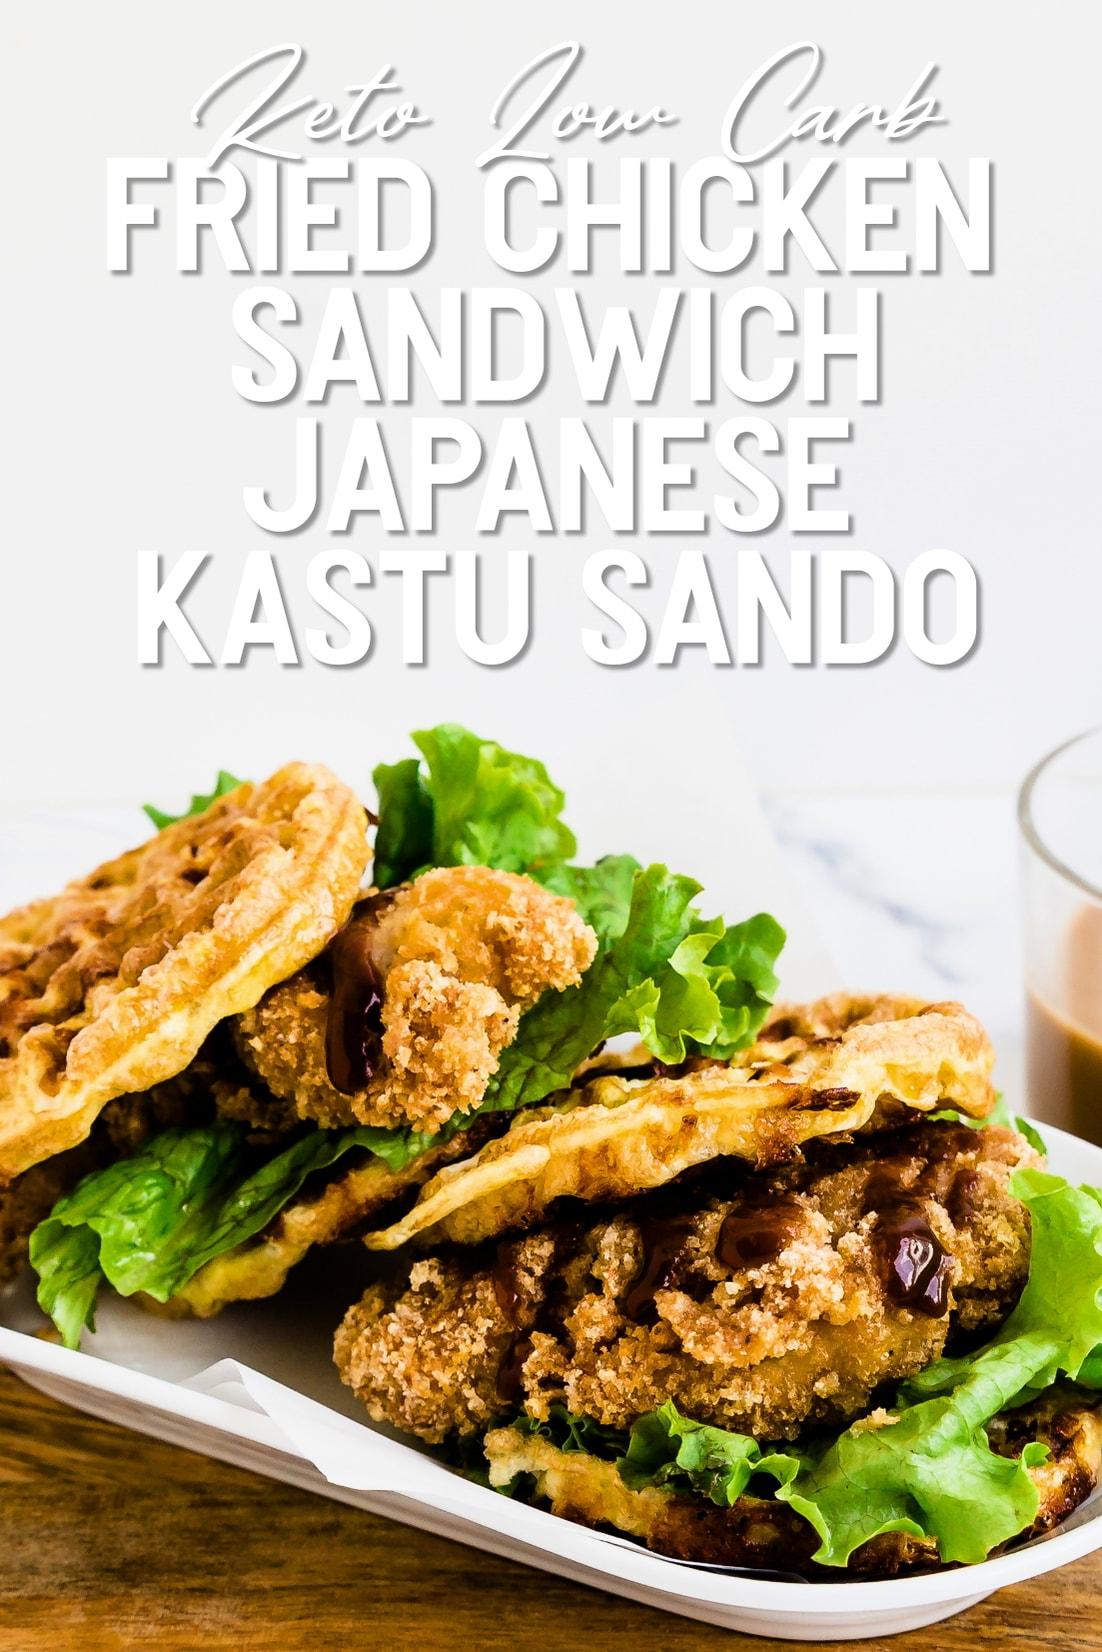 Keto Fried Chicken Sandwich Katsu Sando served on a plate with tonkatsu sauce